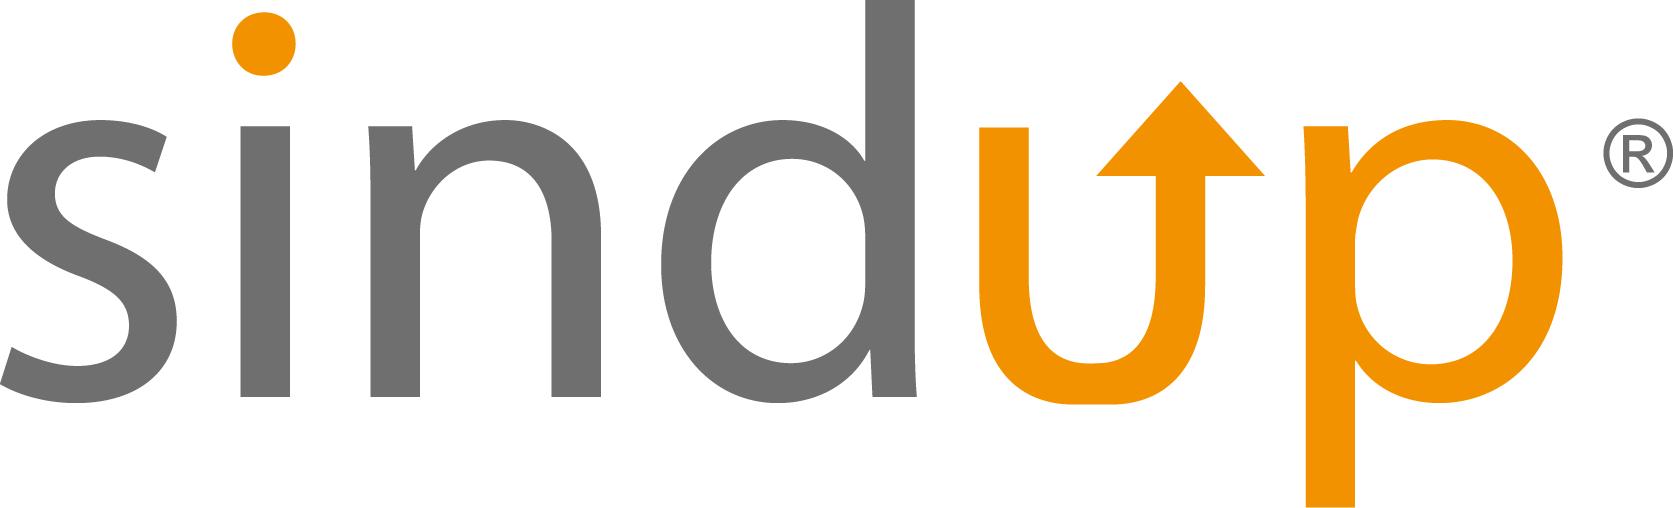 https://pilotesdeprocessus.org/wp-content/uploads/2017/10/logo-sindup.png